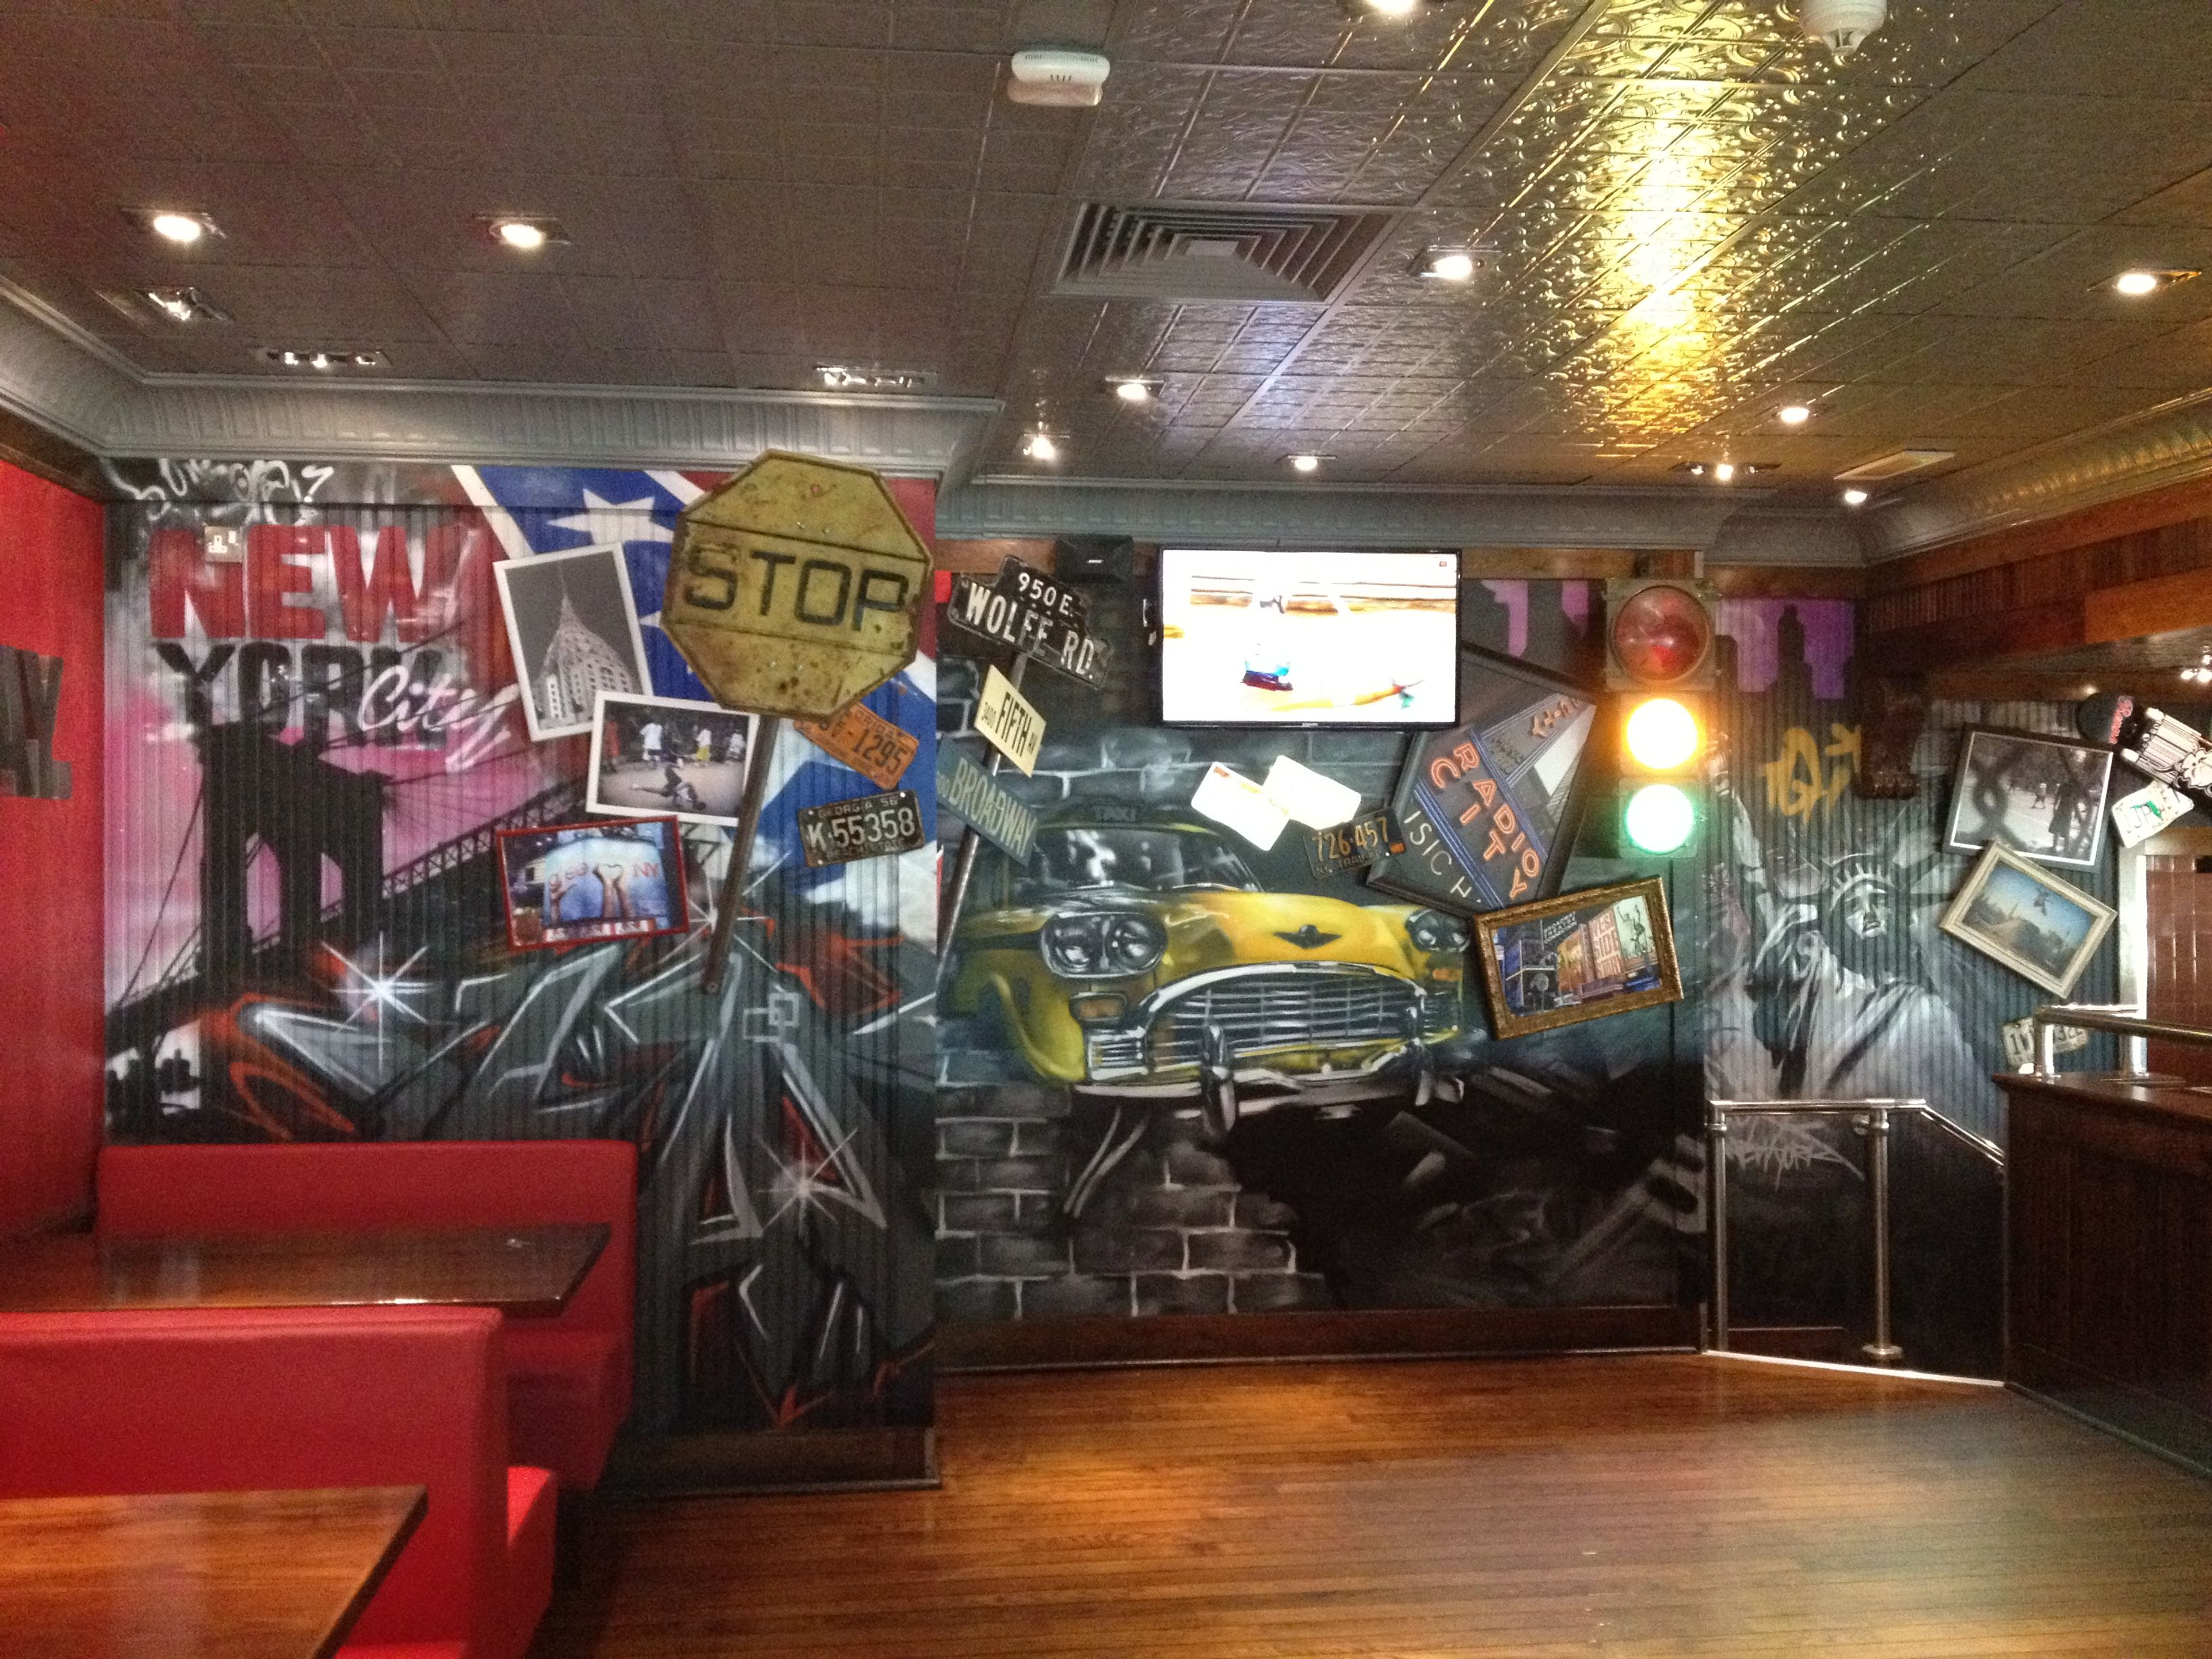 Client tgi fridays restaurant interior graffiti graffiti art and design